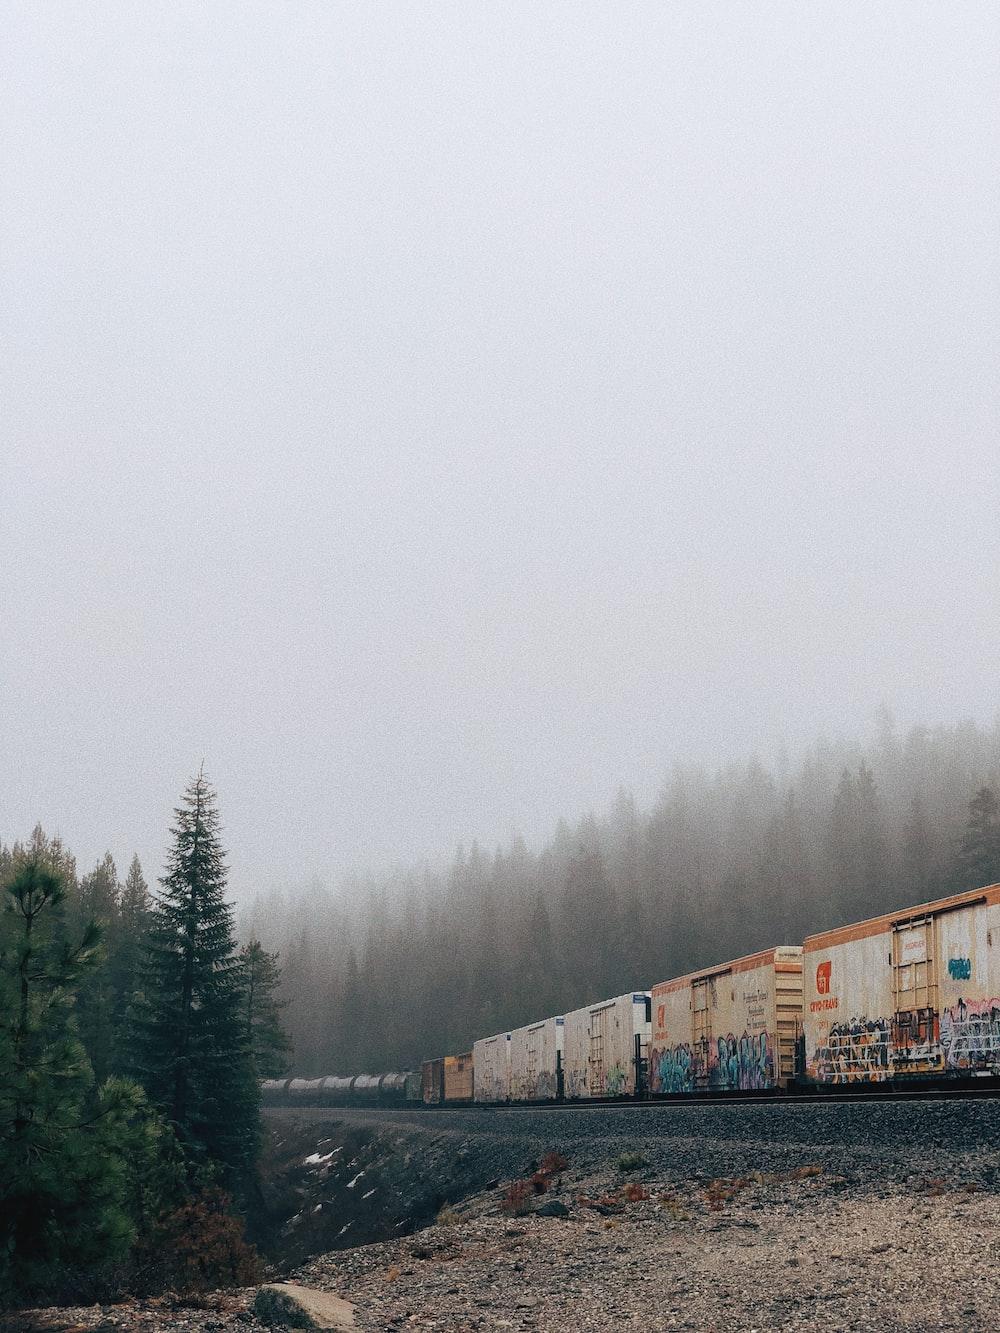 beige train